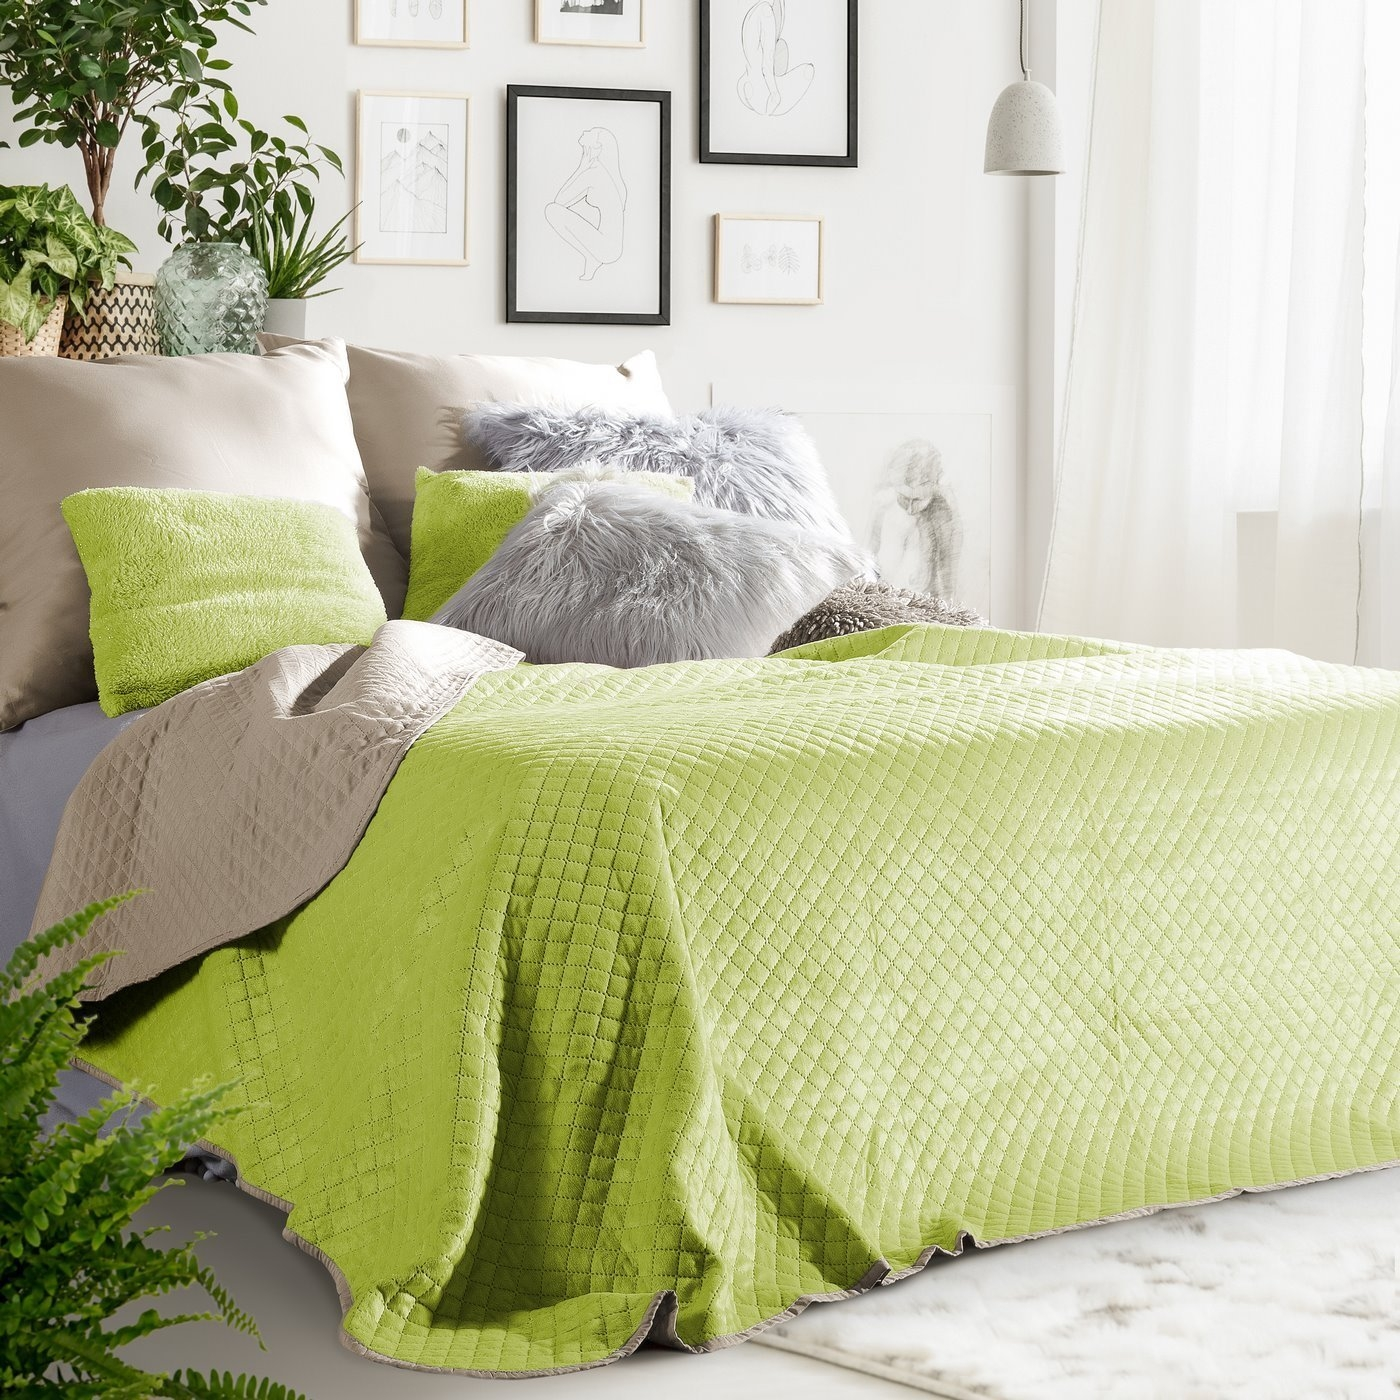 Cuvertura reversibila Filip Beige / Light Green, 220 x 240 cm